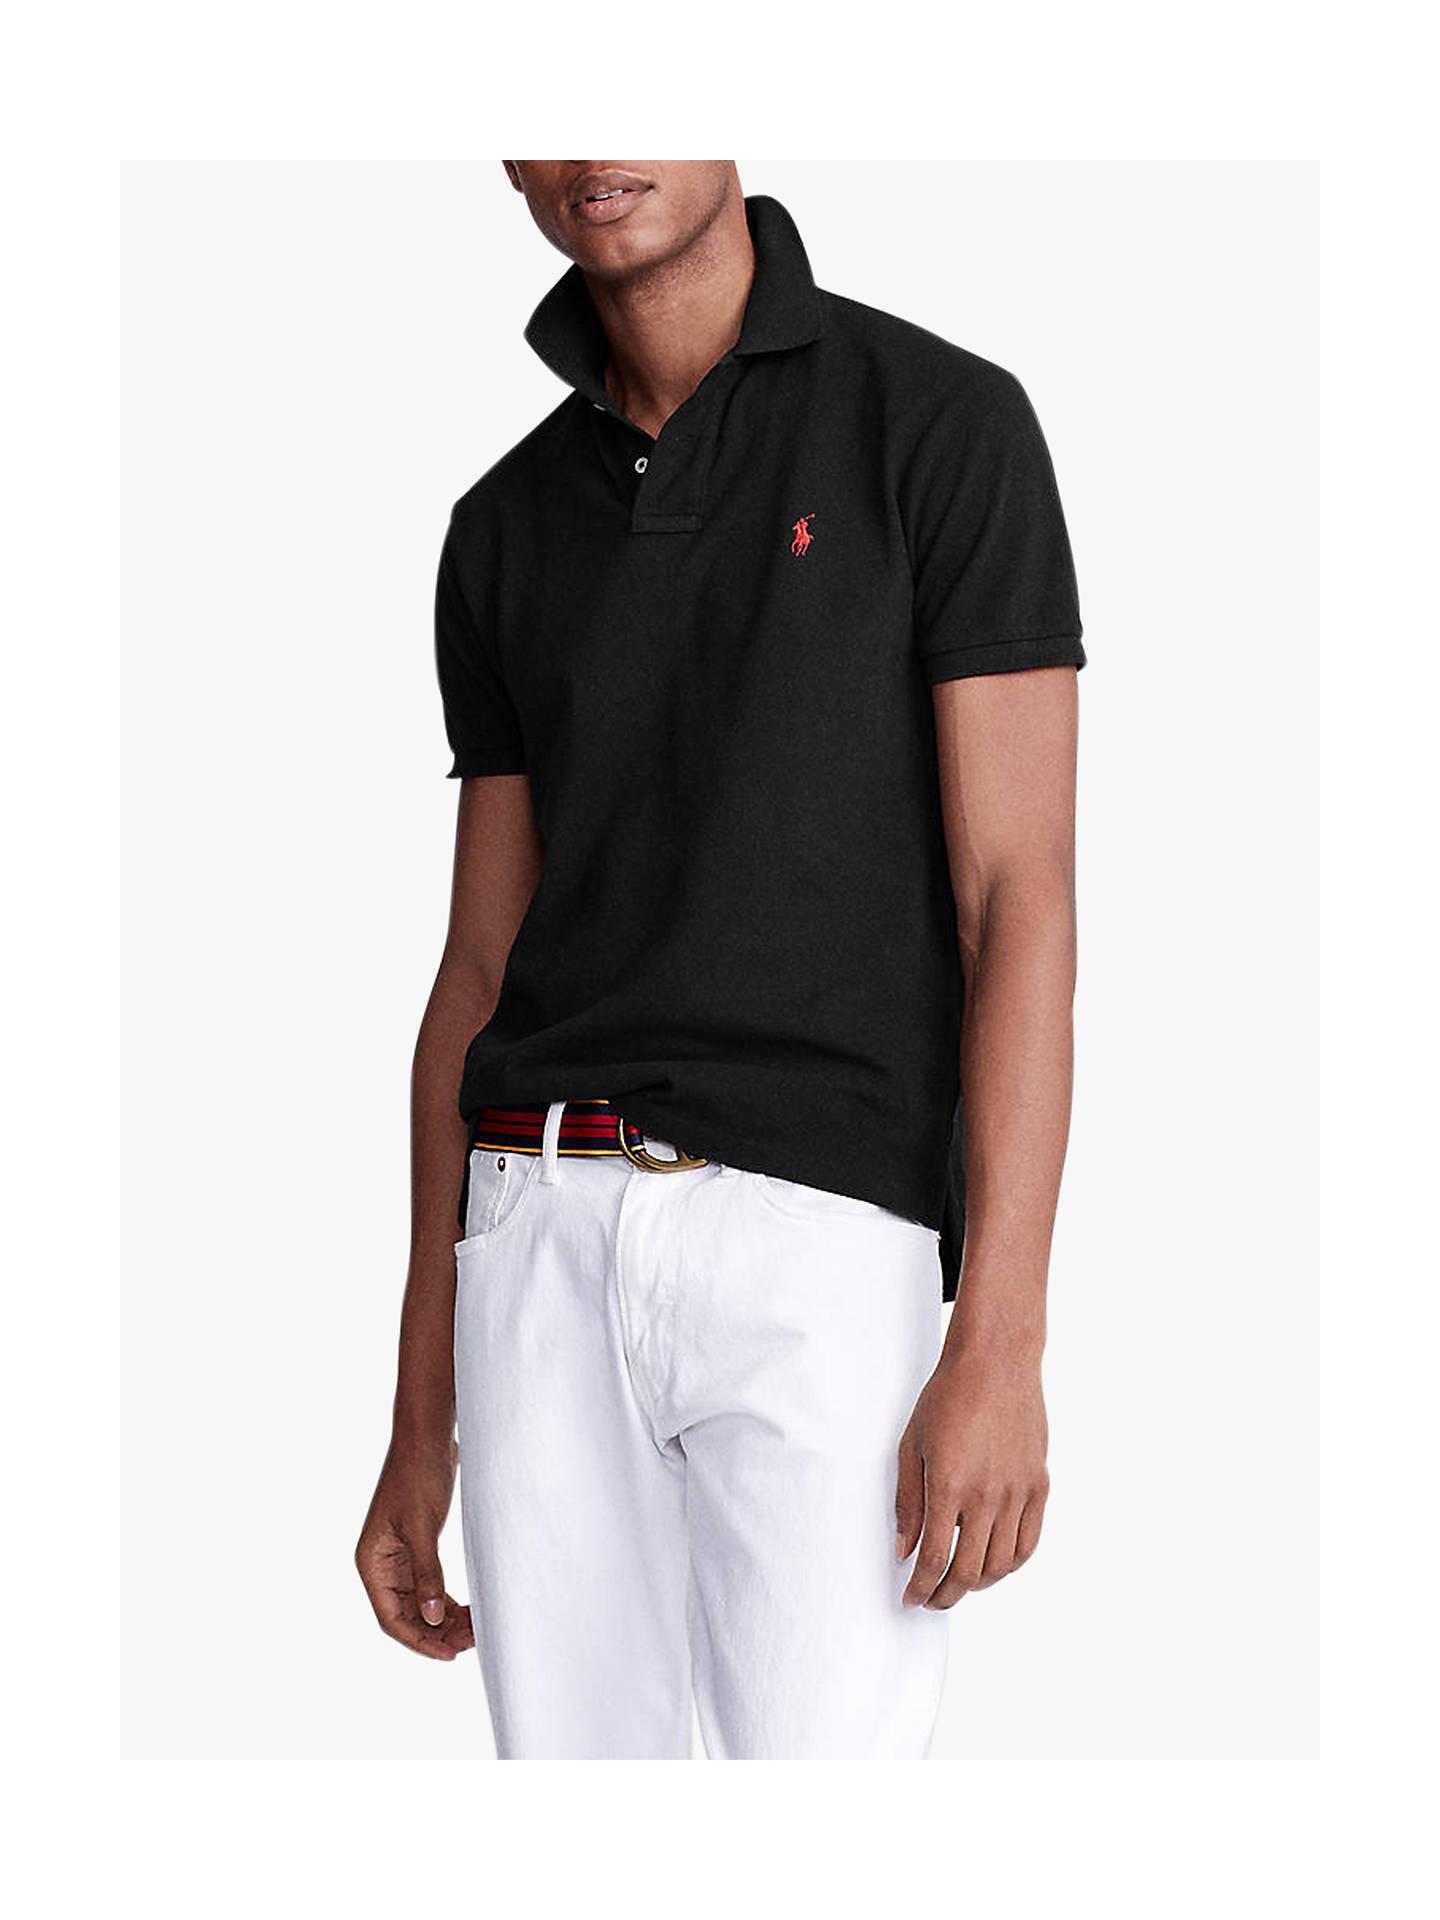 buy online 3d990 98369 Polo Ralph Lauren Short Sleeve Slim Fit Polo Shirt, Polo Black